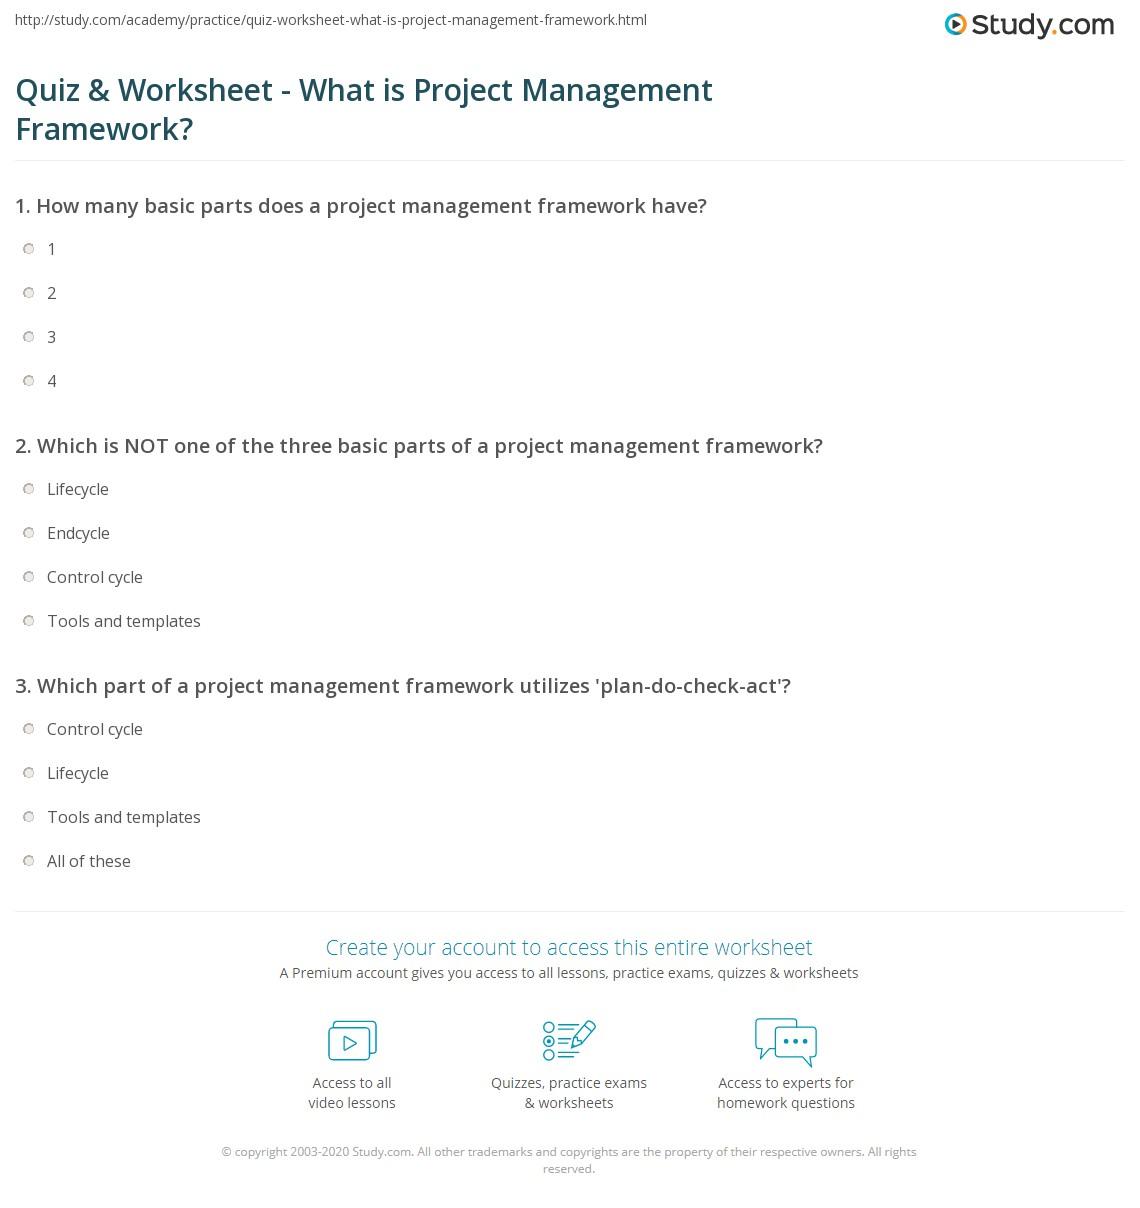 Worksheets Project Management Worksheets quiz worksheet what is project management framework study com print a definition examples worksheet